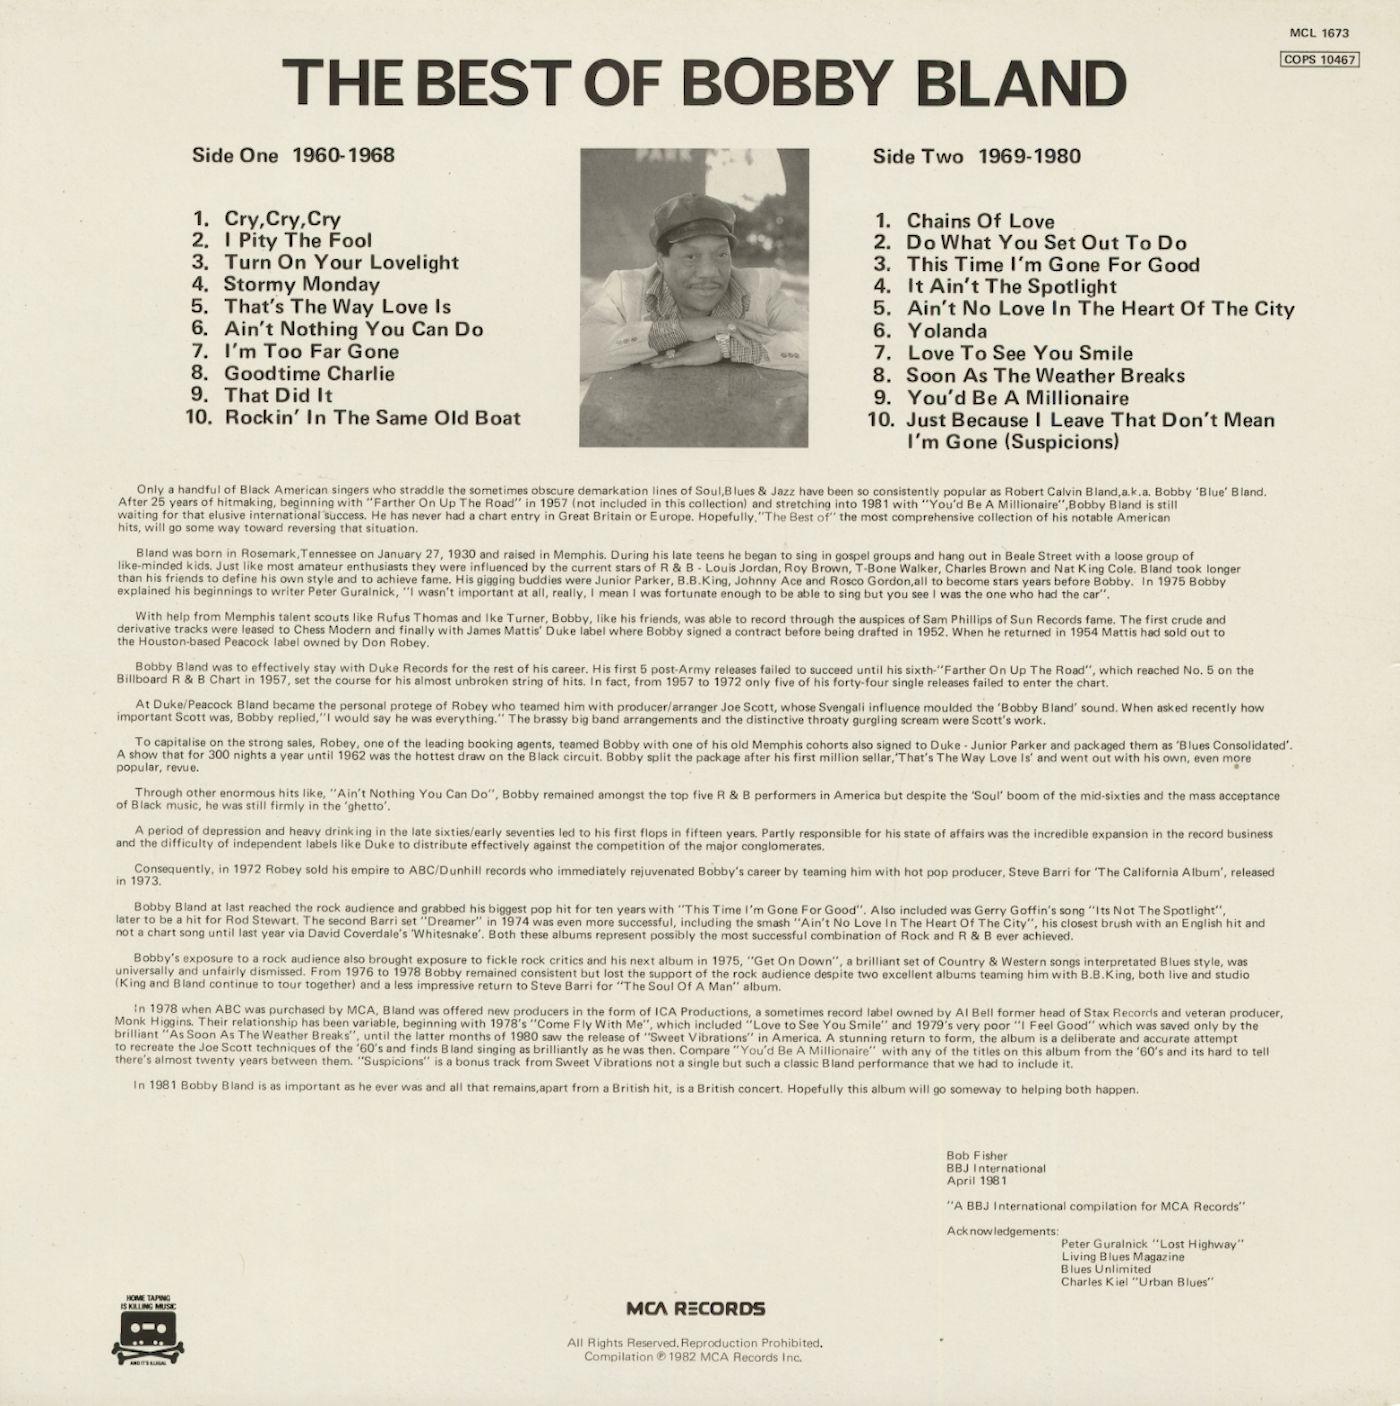 Bobby Blue Bland LP: The Best Of Bobby Bland (LP) - Bear Family Records